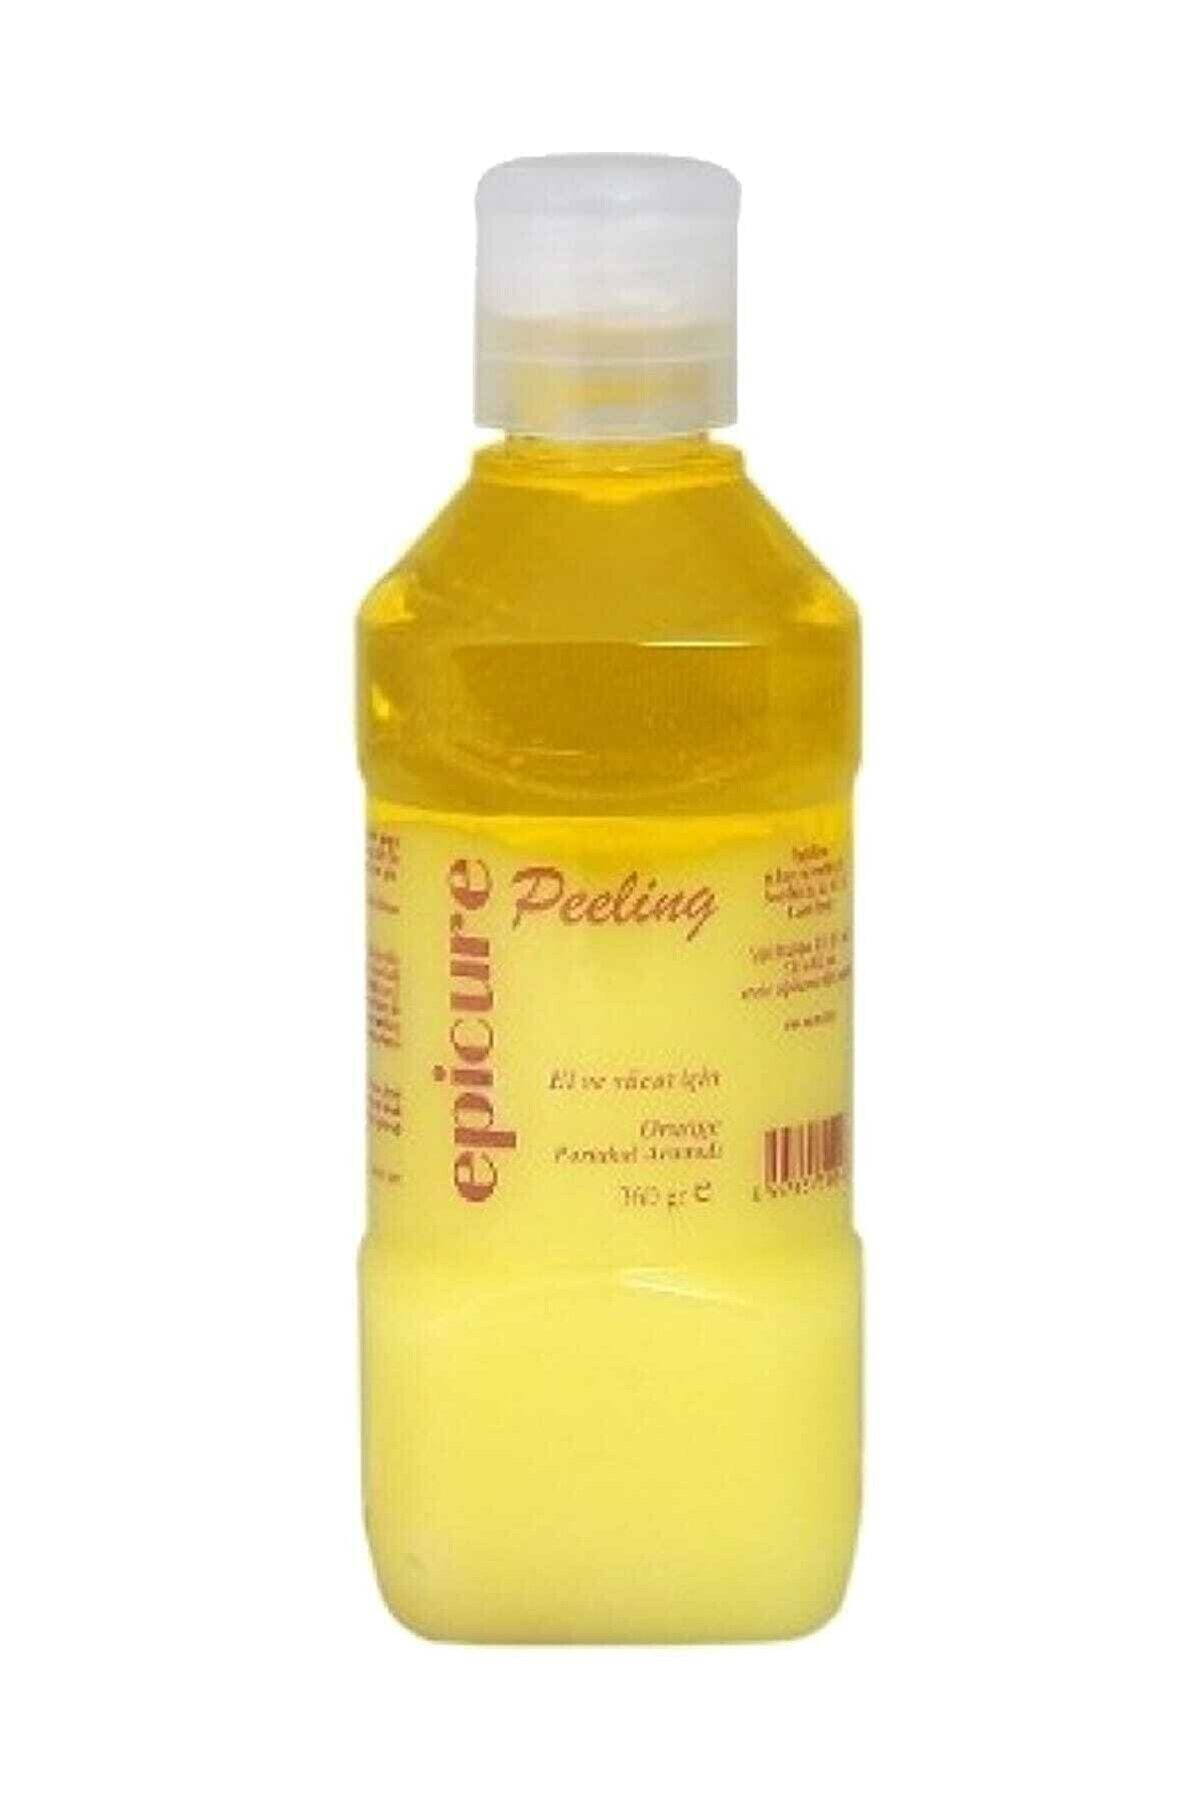 Epicure Portakal Aromalı Peeling 360 G